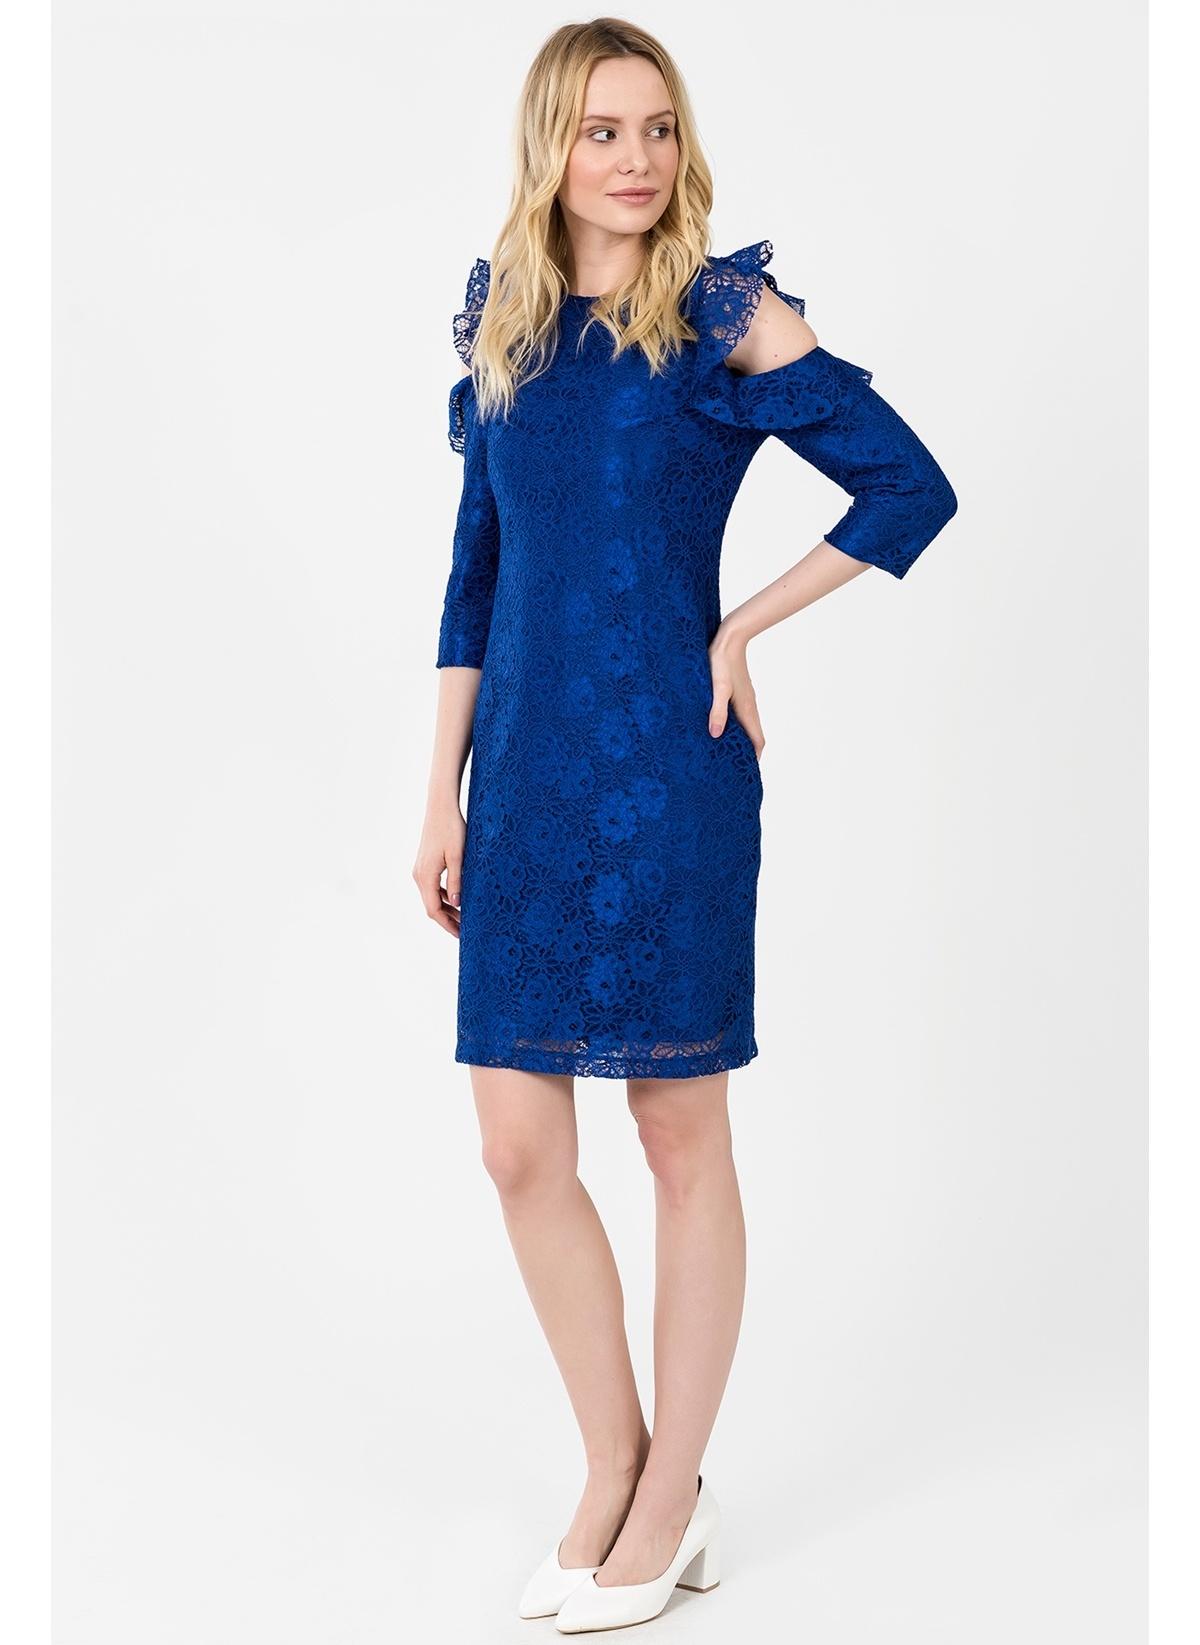 d9b4eee4f6240 İroni Kadın Kol Detaylı Dantel Elbise Saks | Morhipo | 21619756